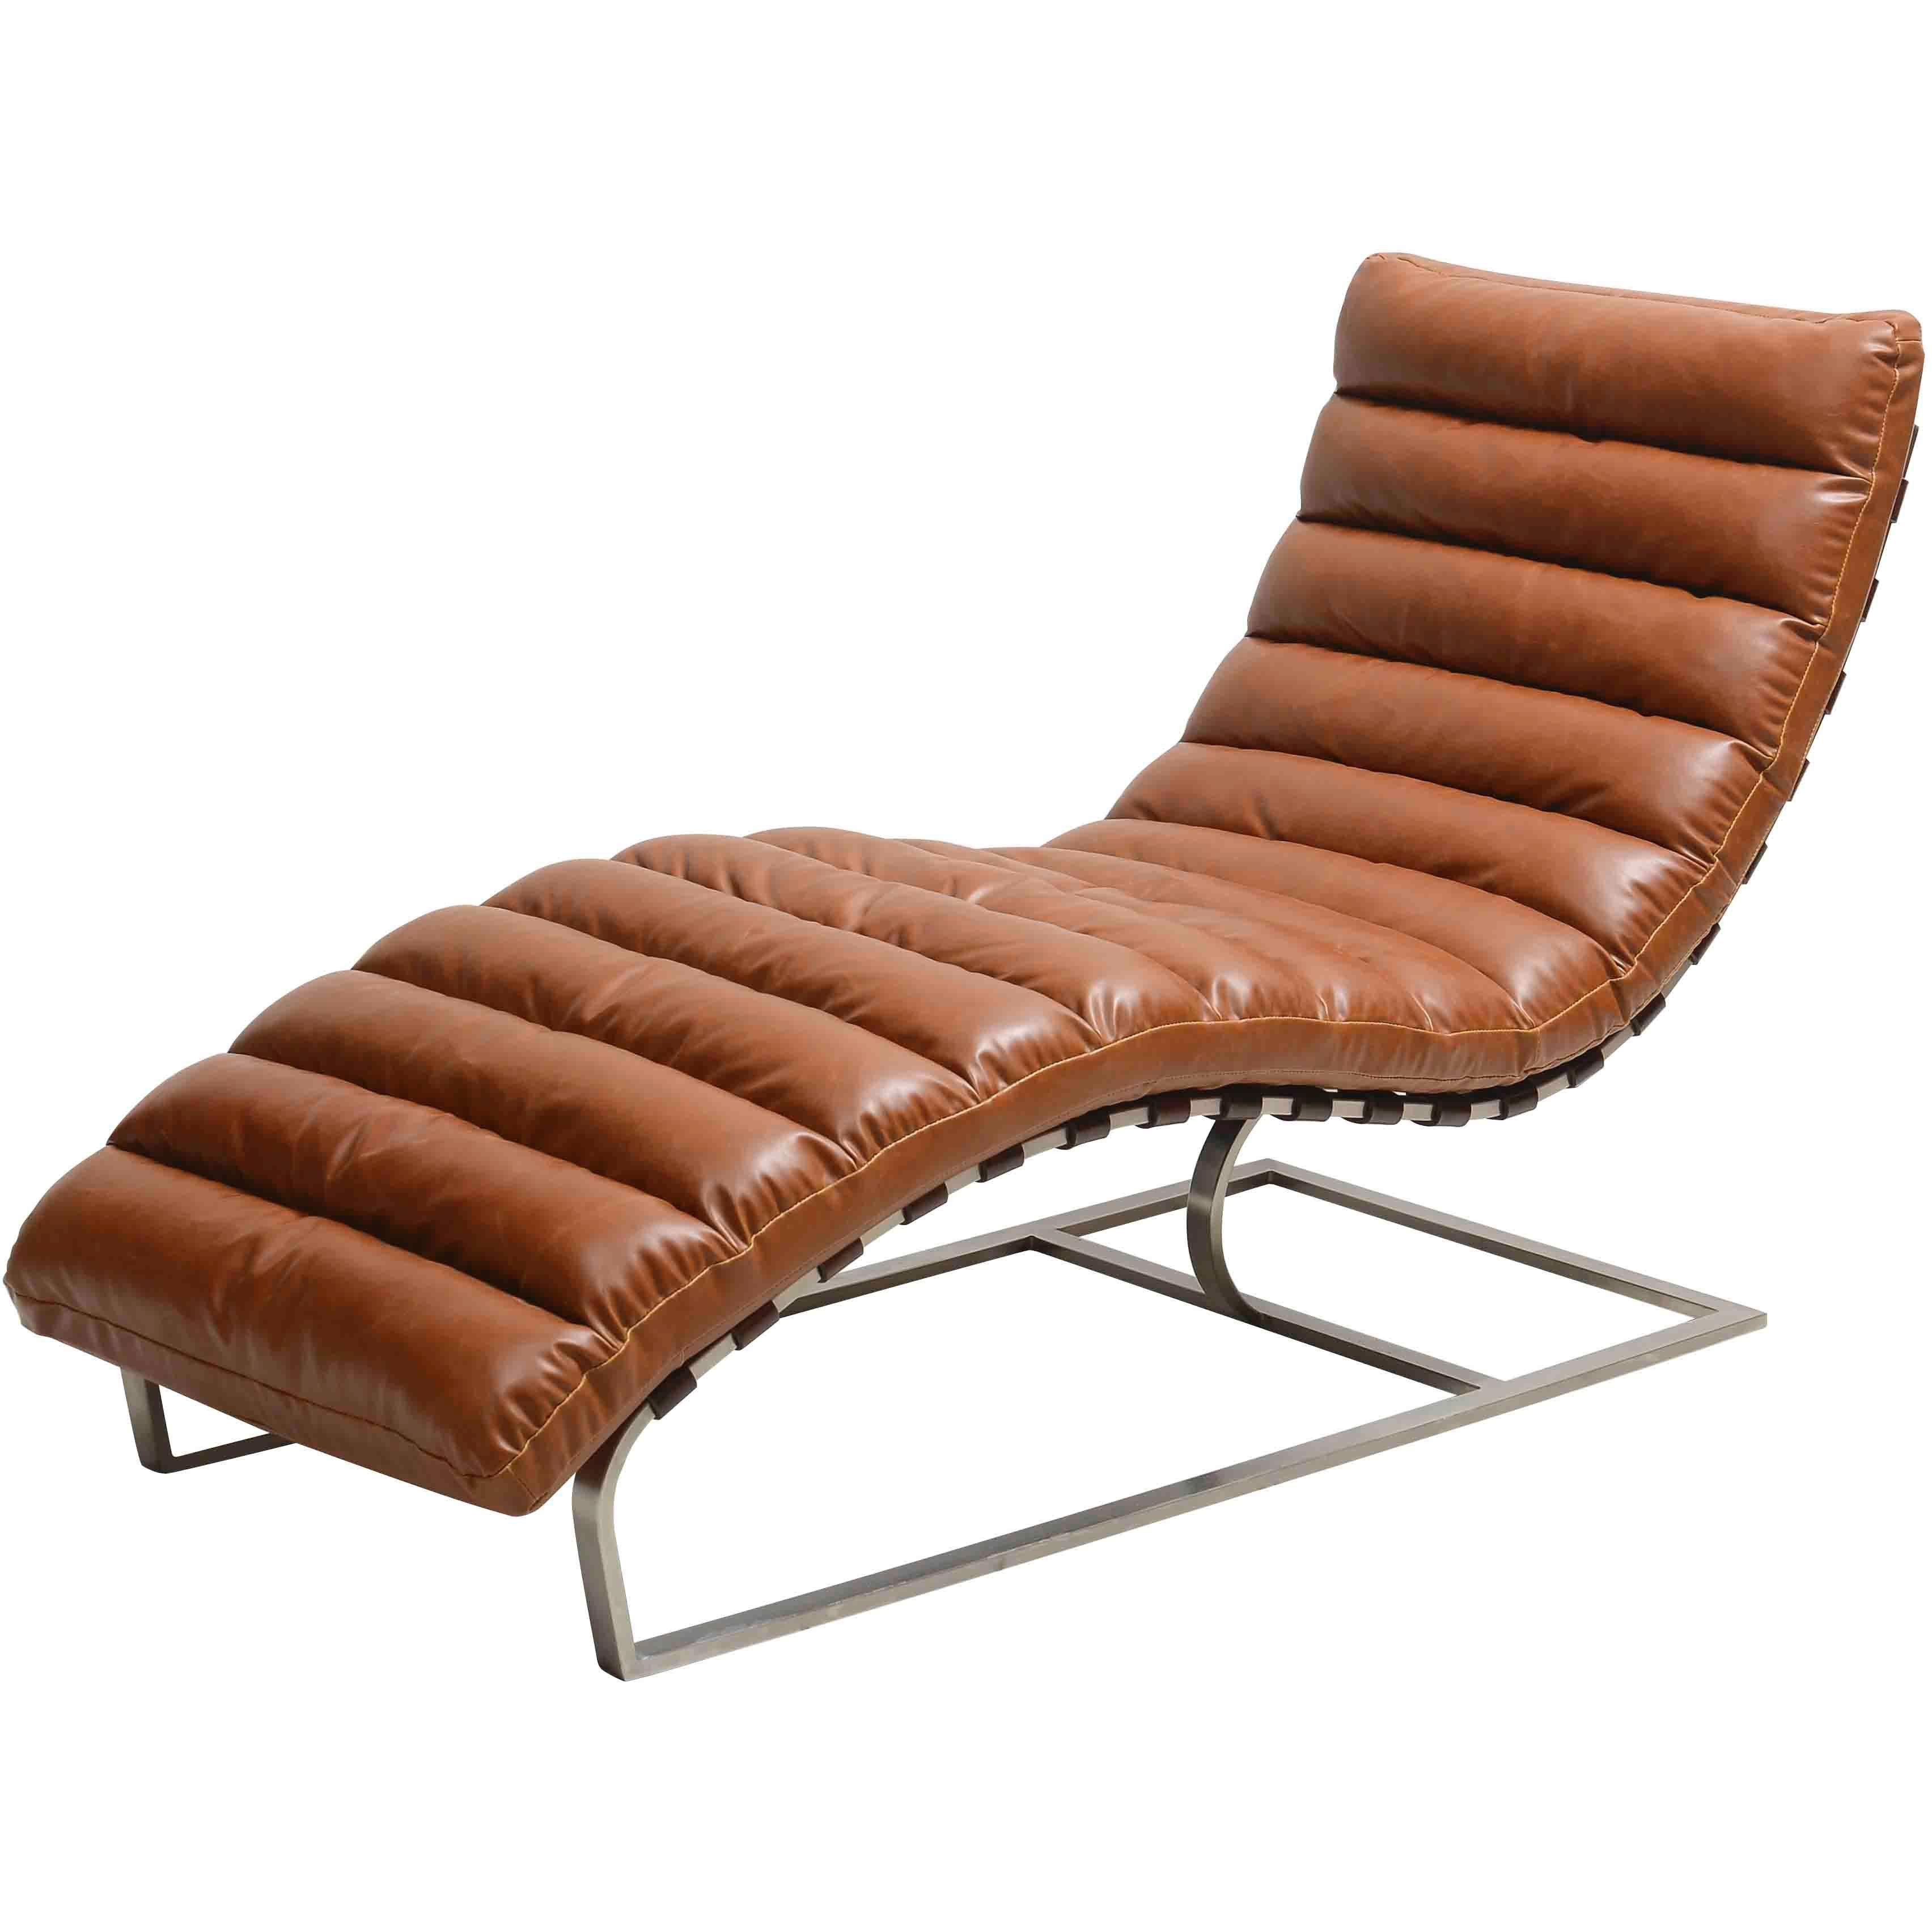 Cavett Chaise Lounge NPD 850 | Chairs | Furniture, Lounge, Chair